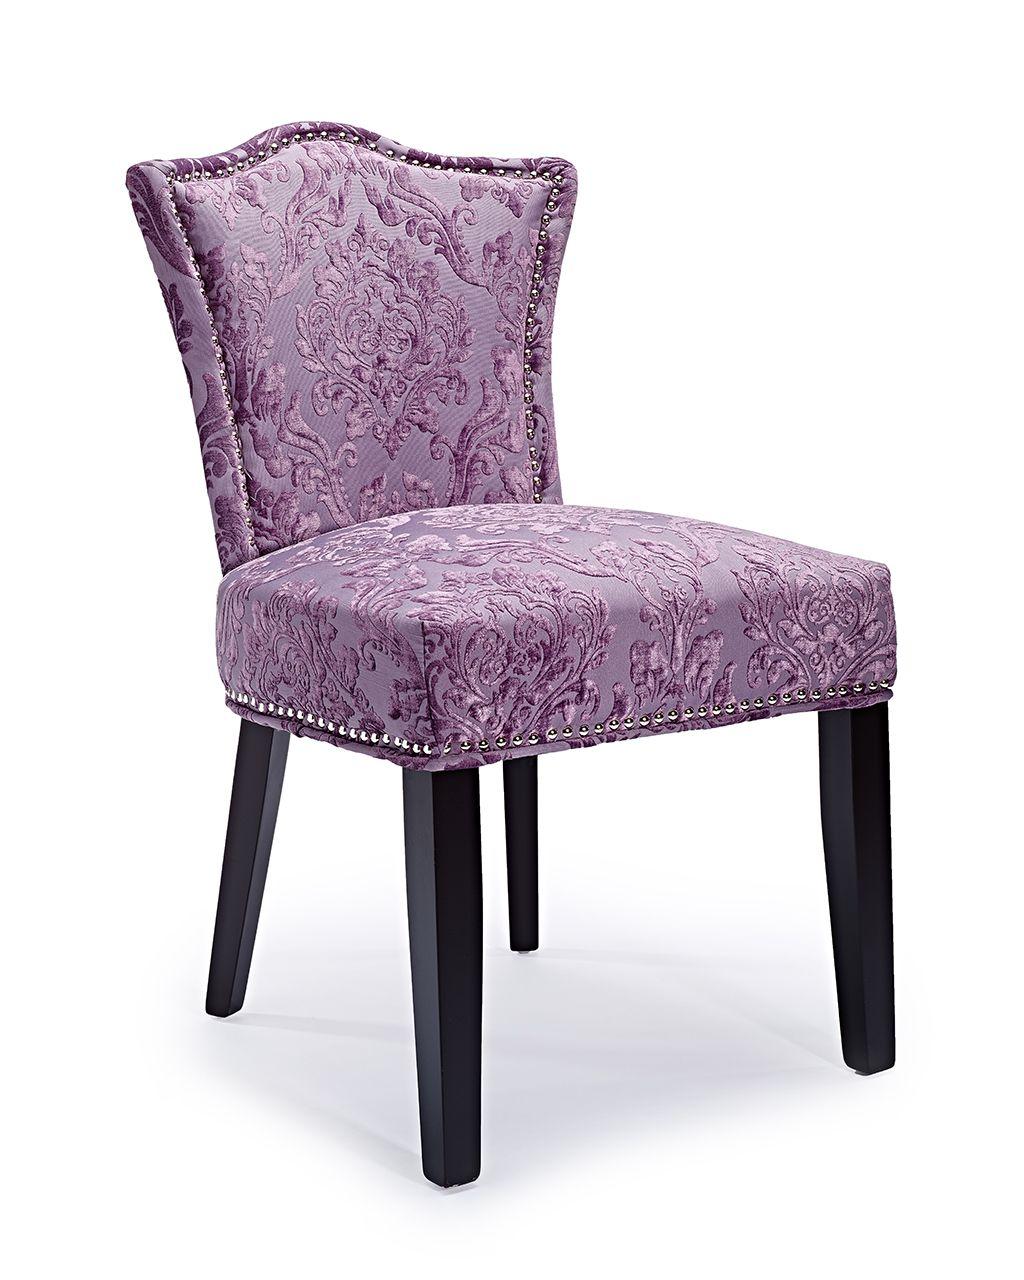 Purple Studded Chair Accent Chair Tj Maxx Furniture